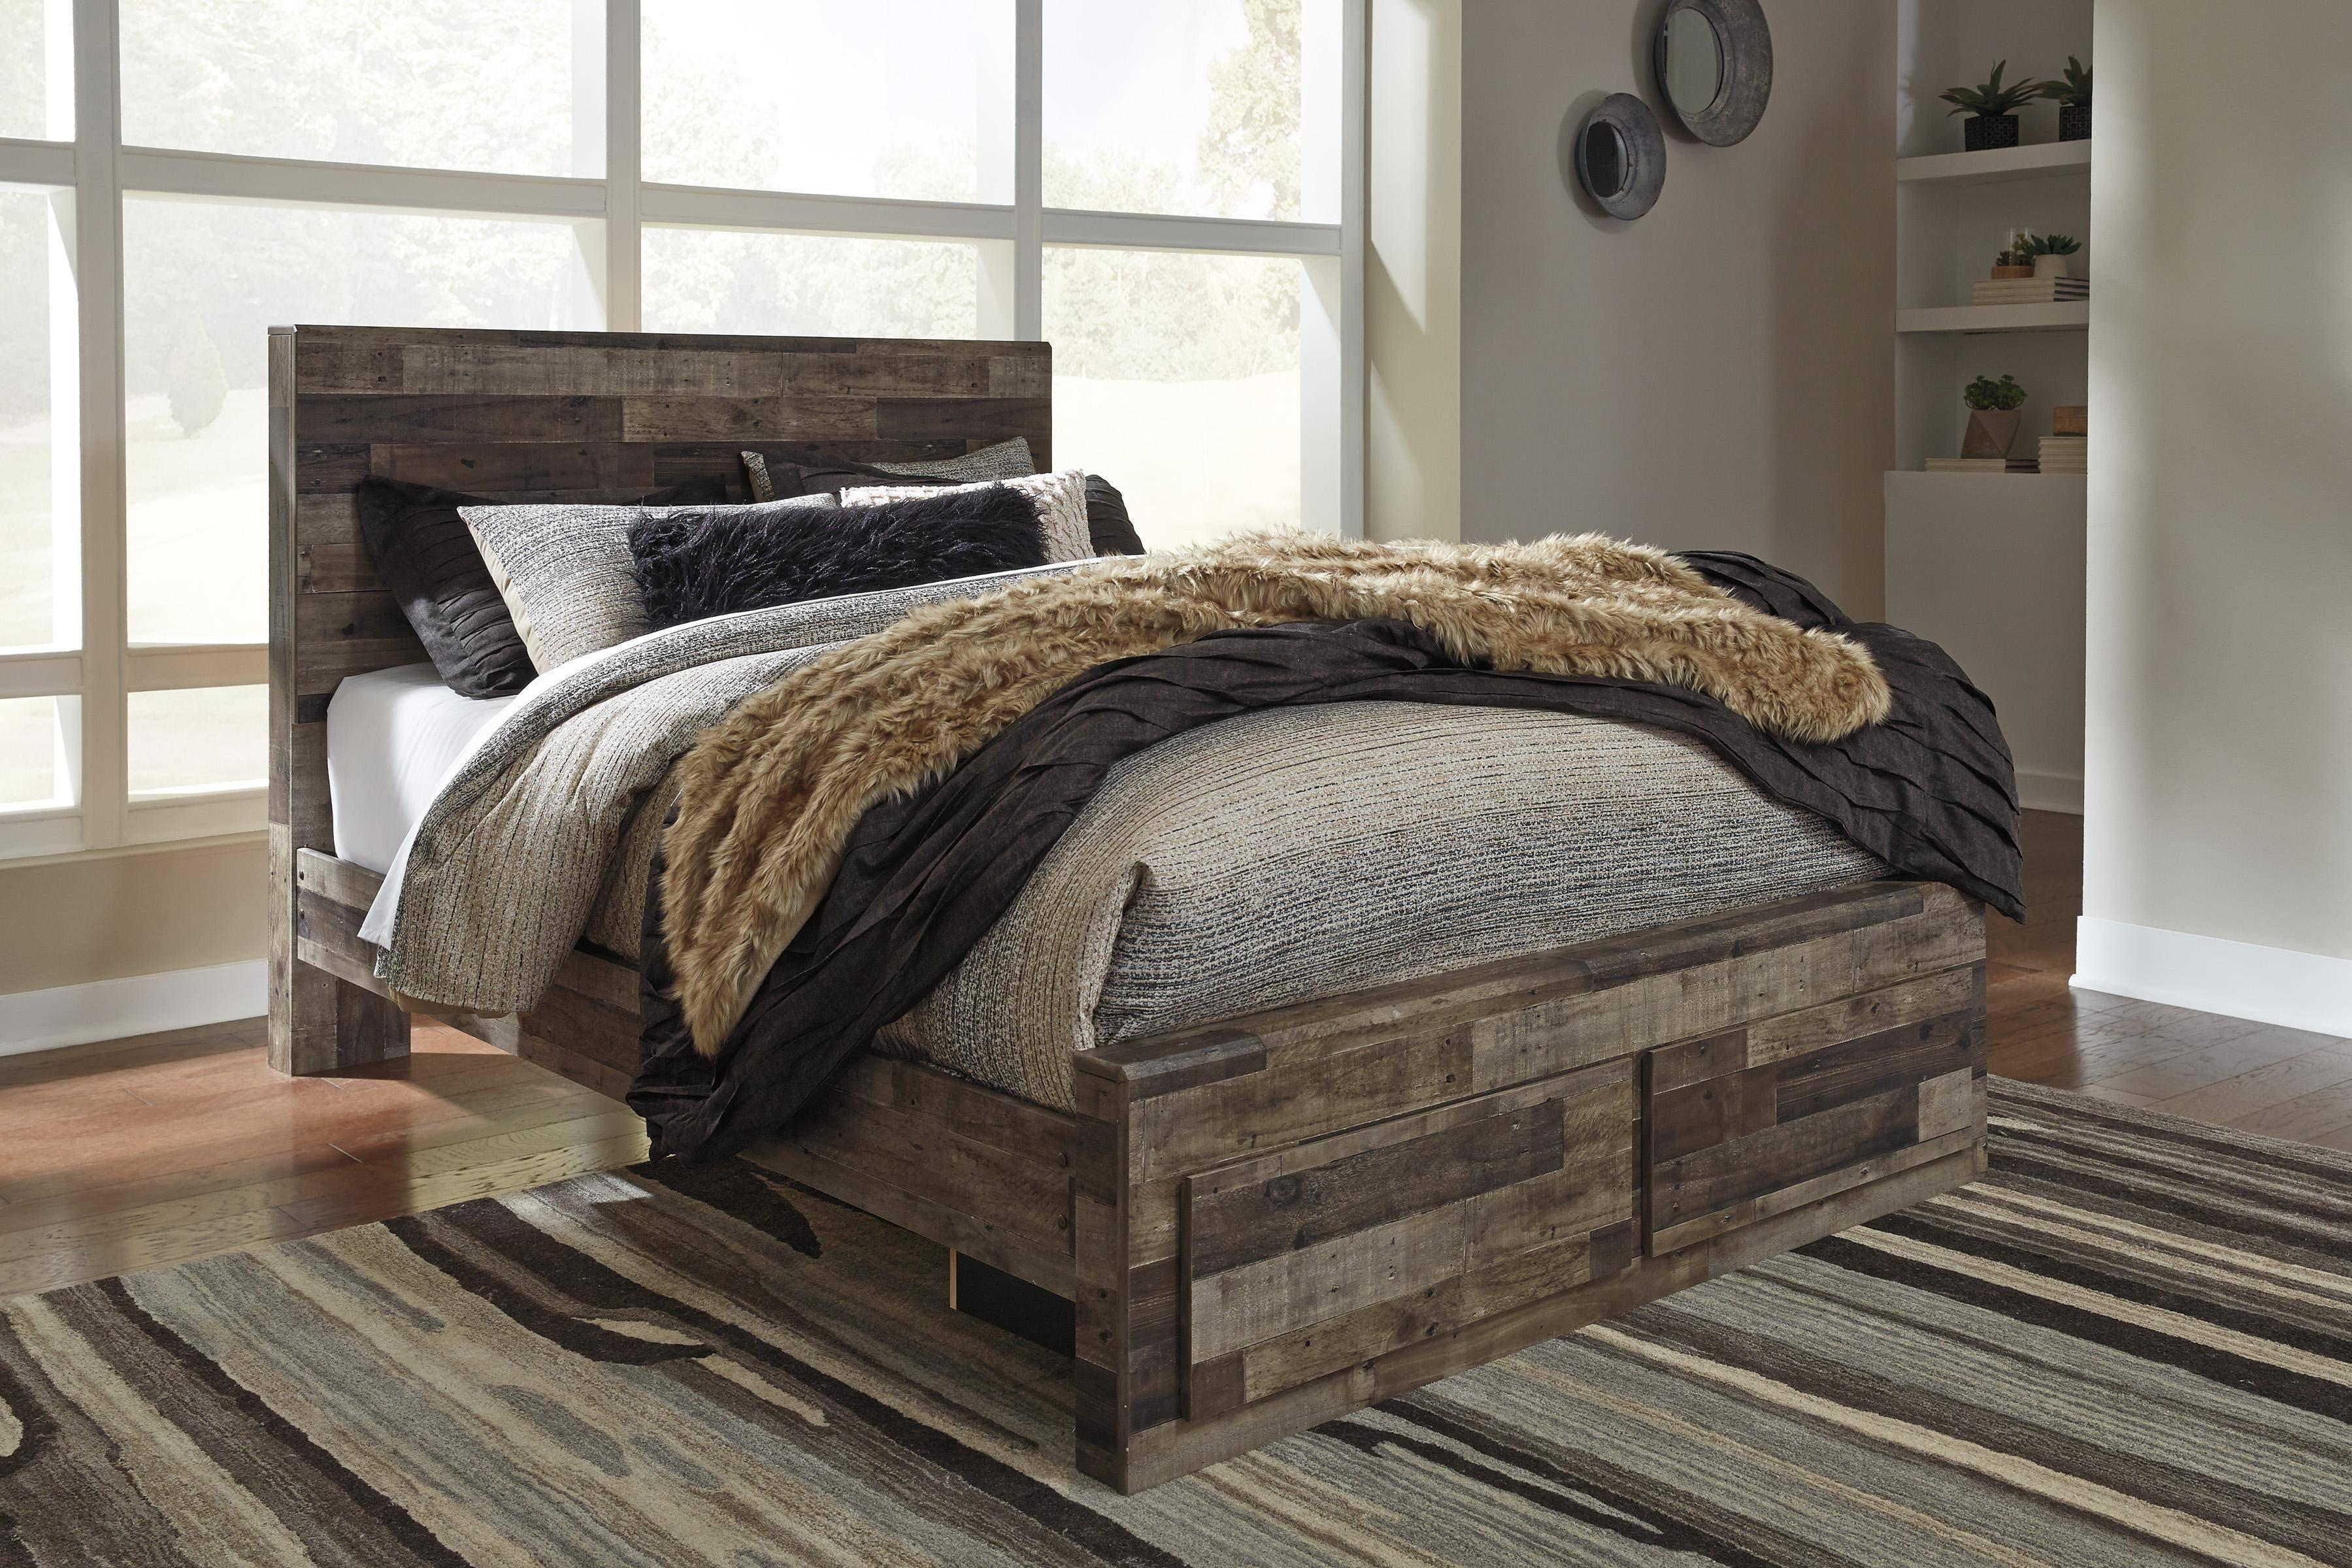 Ashley White Bedroom Set Awesome ashley Derekson King Storage Bedroom Set 6 Pcs In Multi Gray Wood